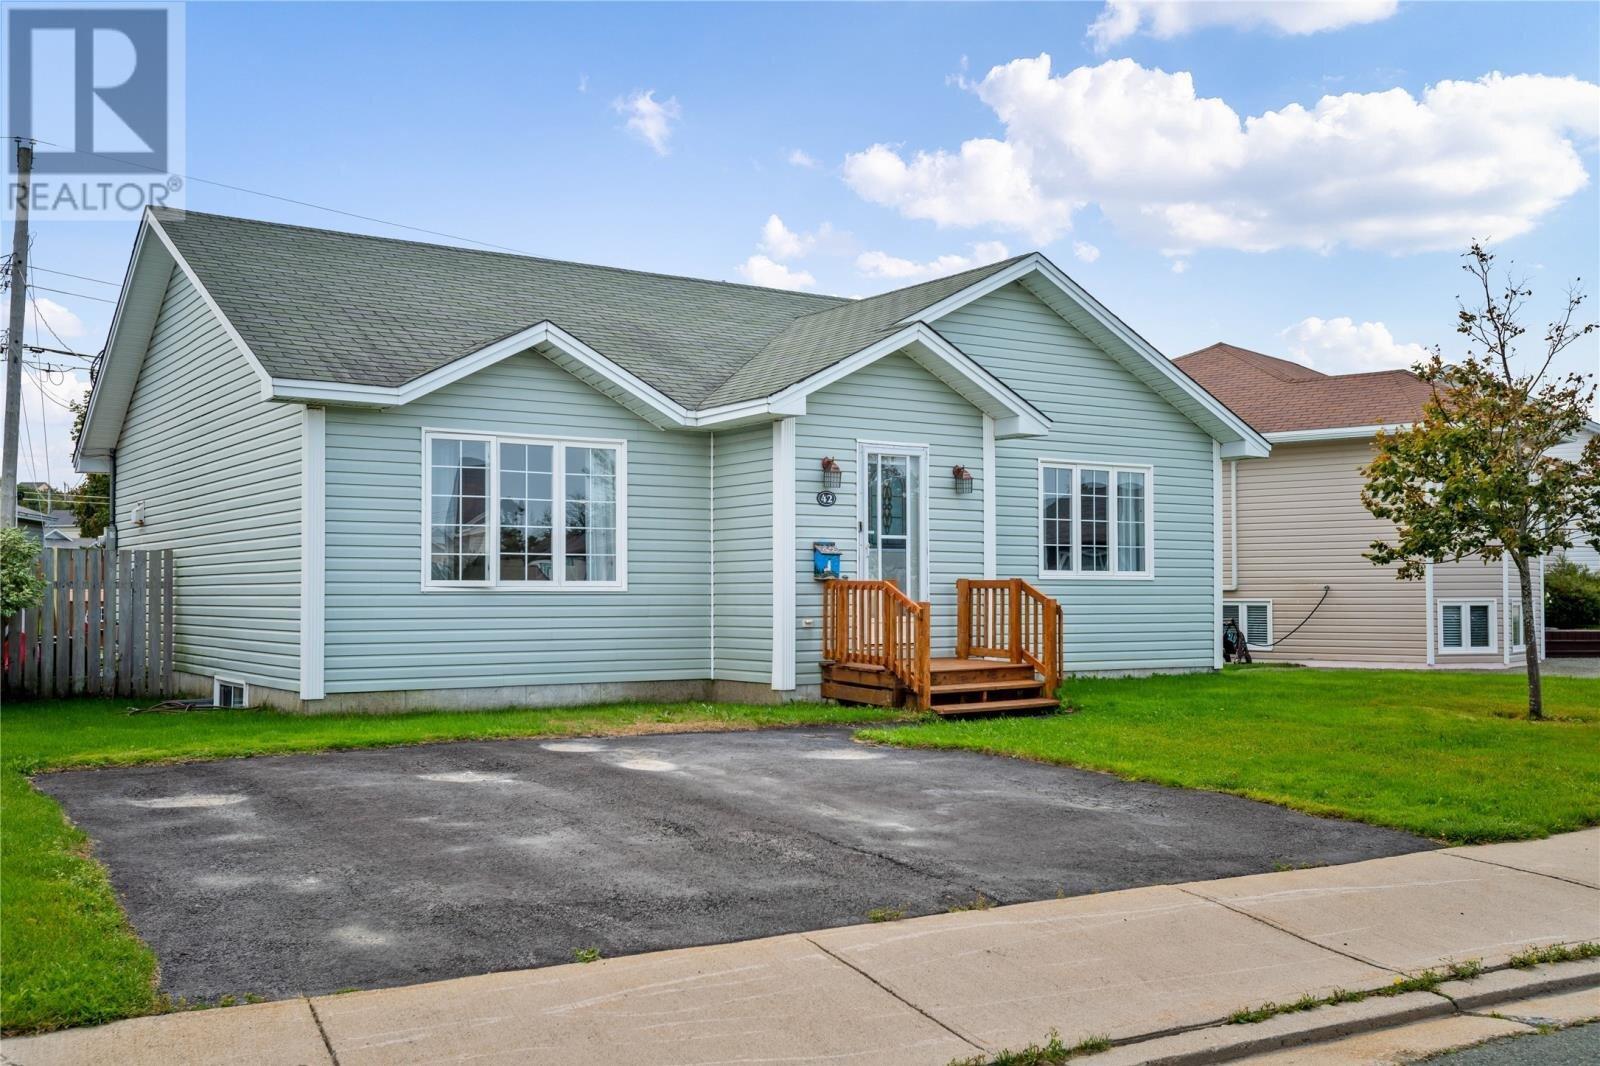 House for sale at 42 Malka Dr St. John's Newfoundland - MLS: 1224682